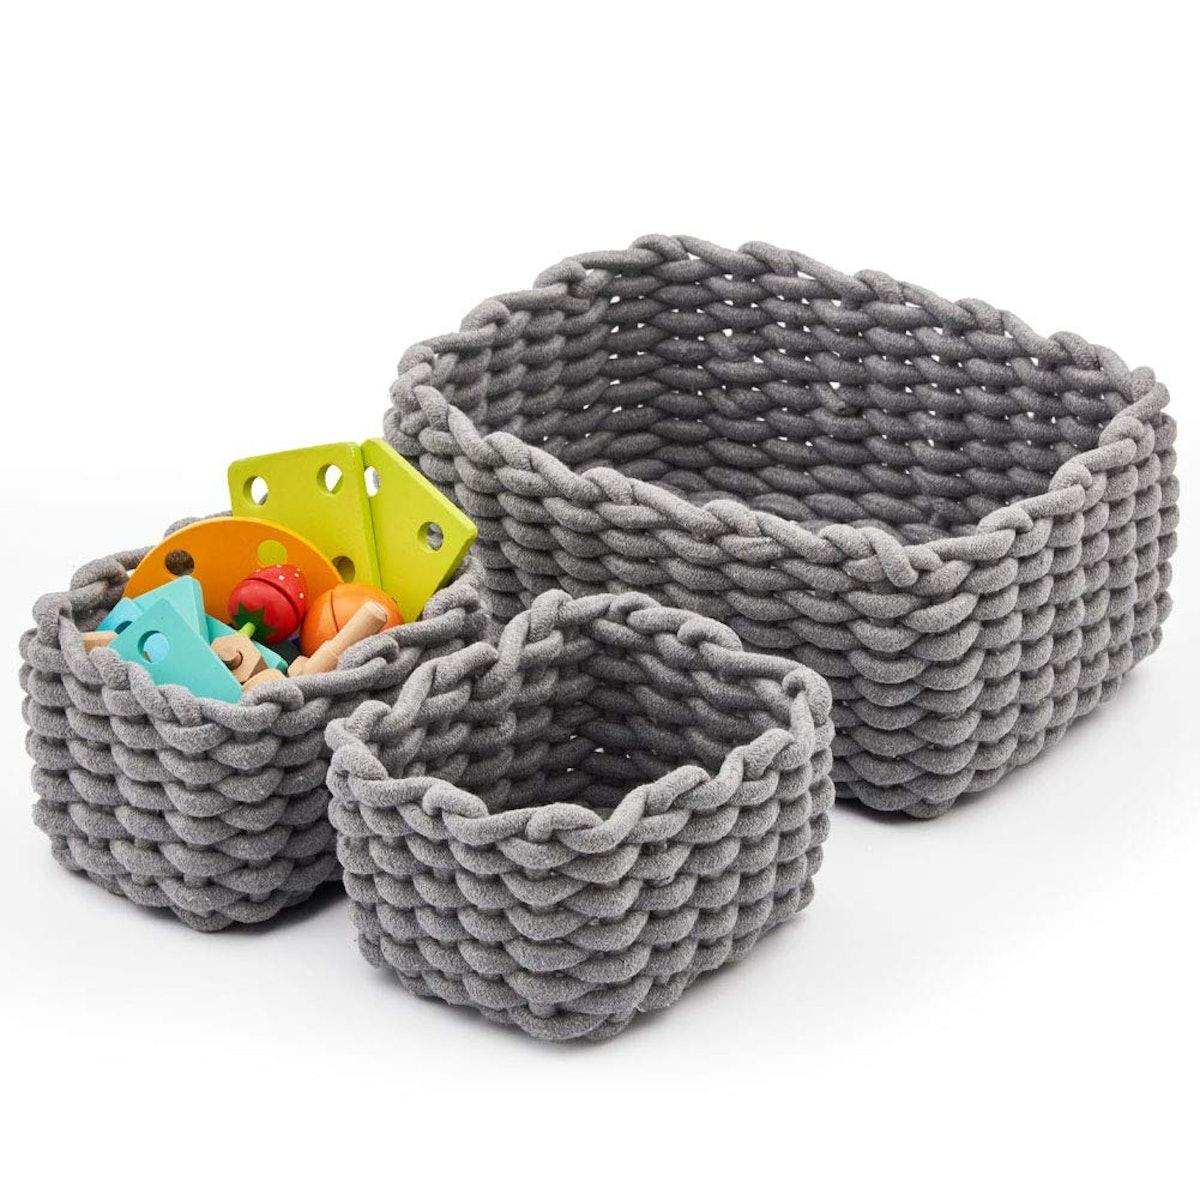 EZOWare Cotton Rope Baskets (Set of 3)